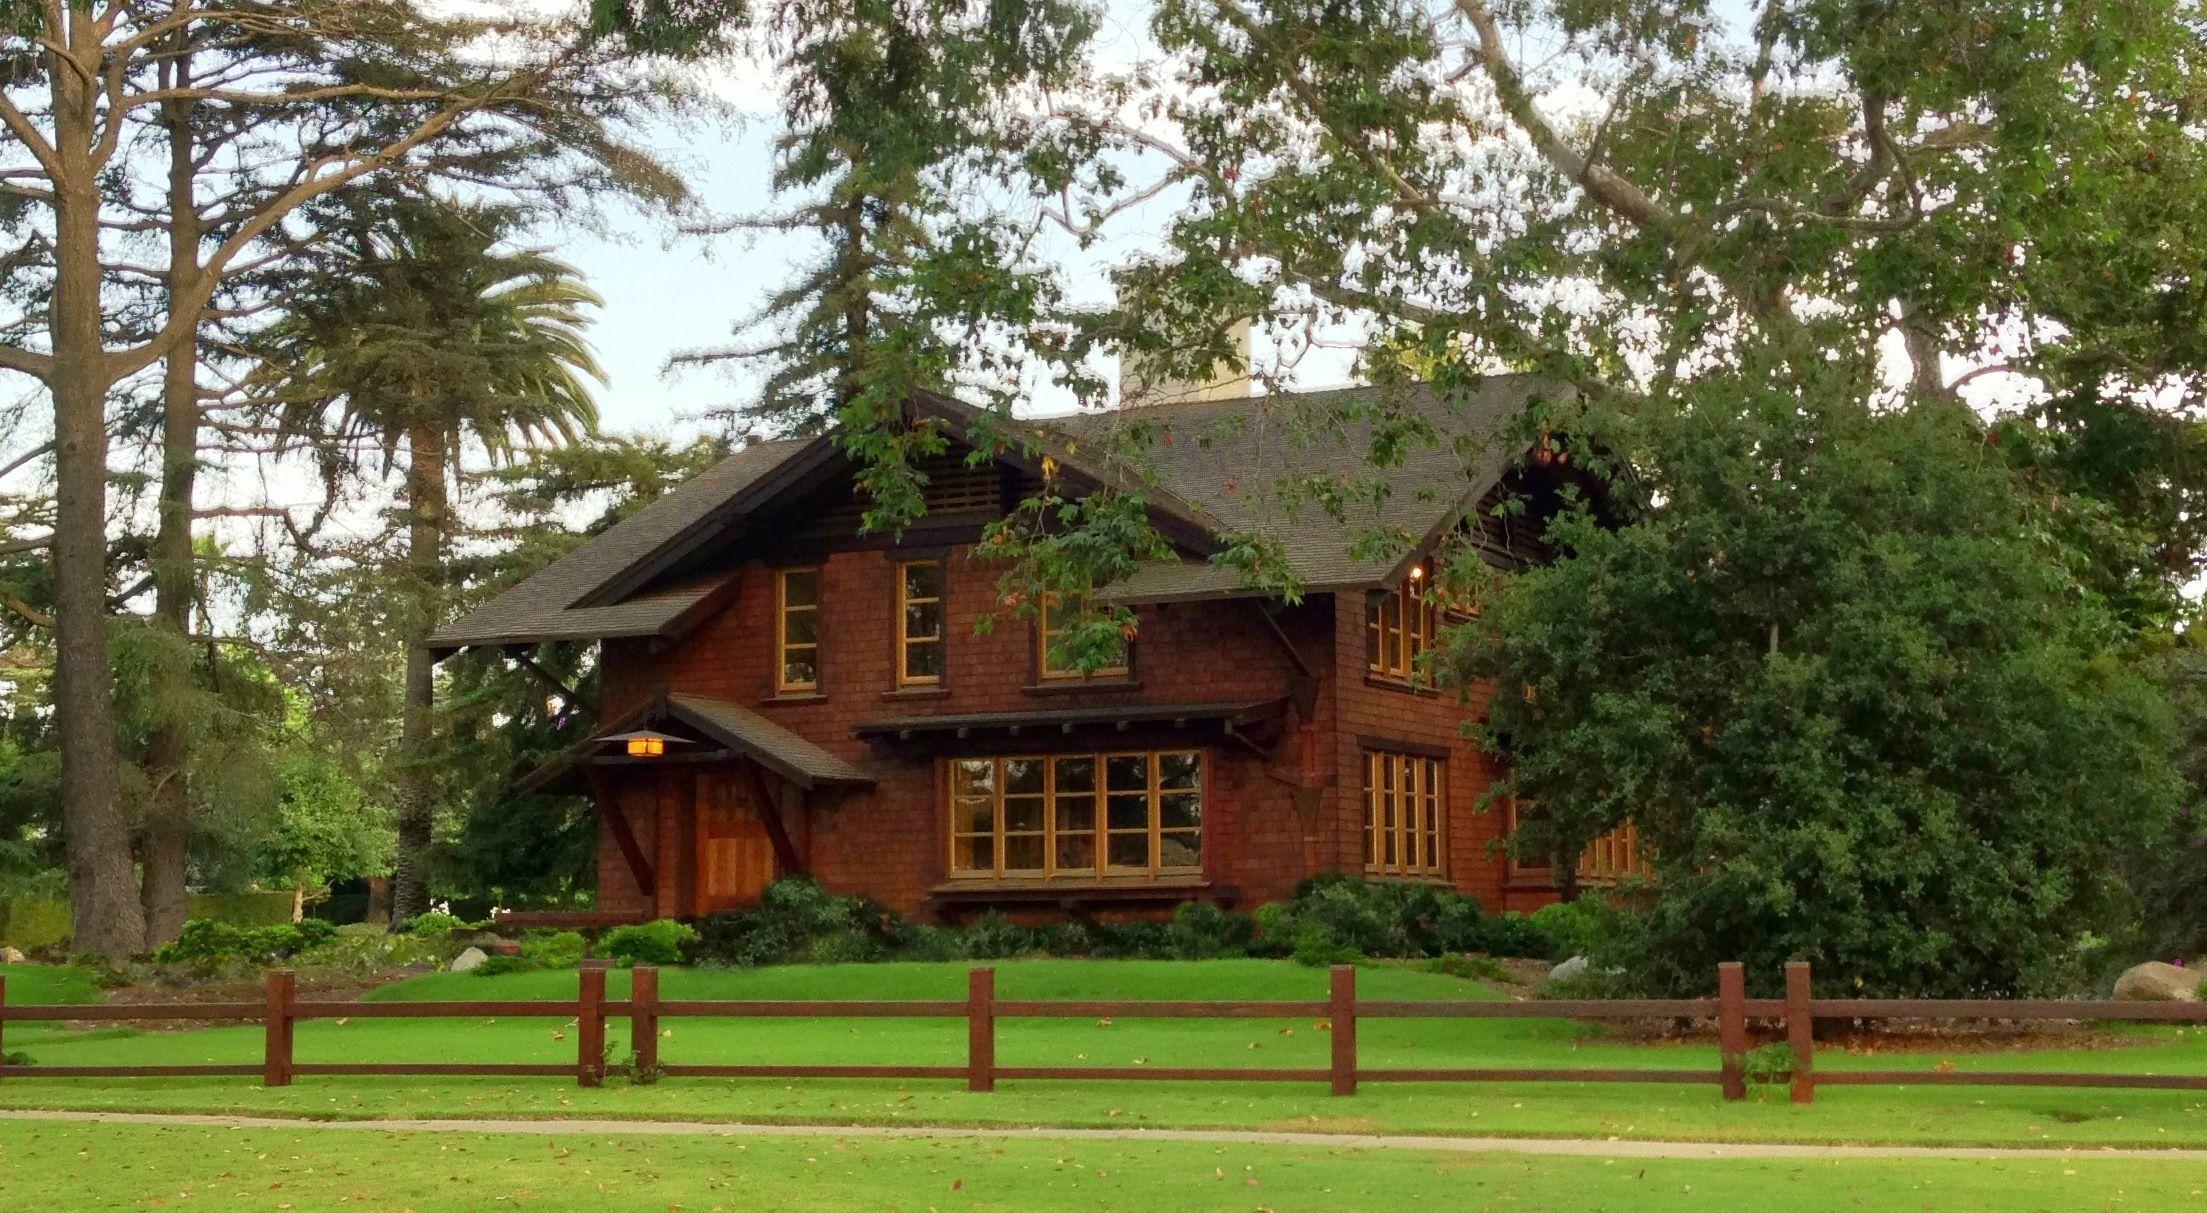 Reeve Townsend House In Long Beach CA A Greene